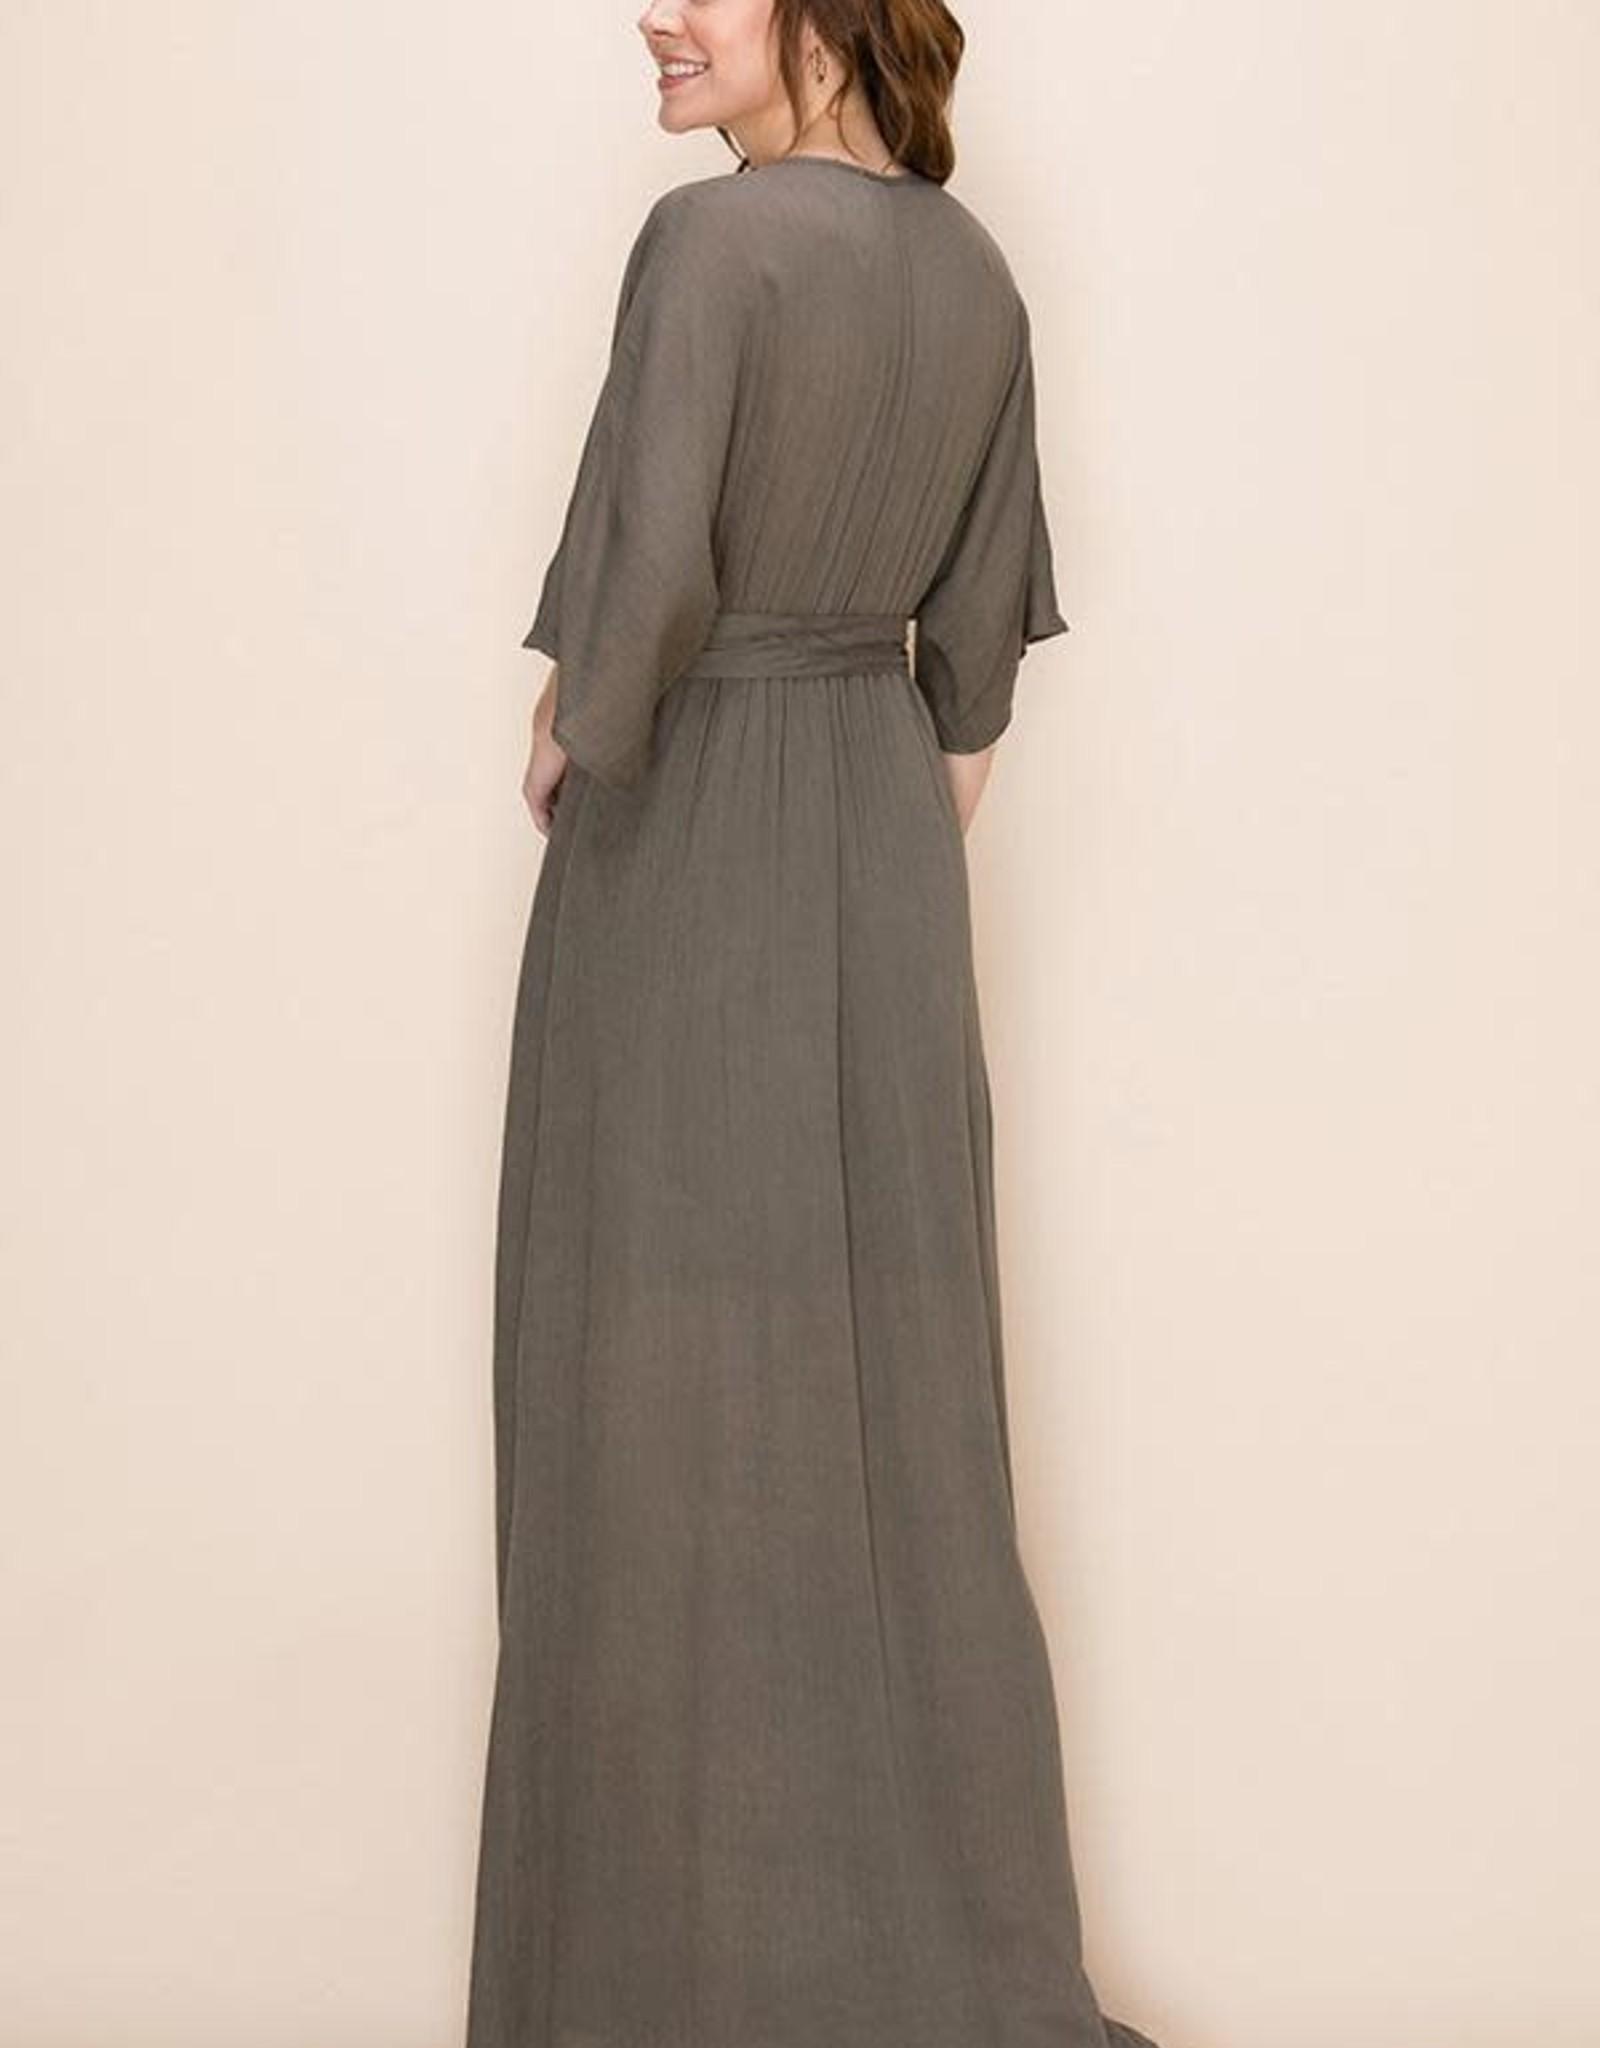 HYFVE Draped Maxi Dress